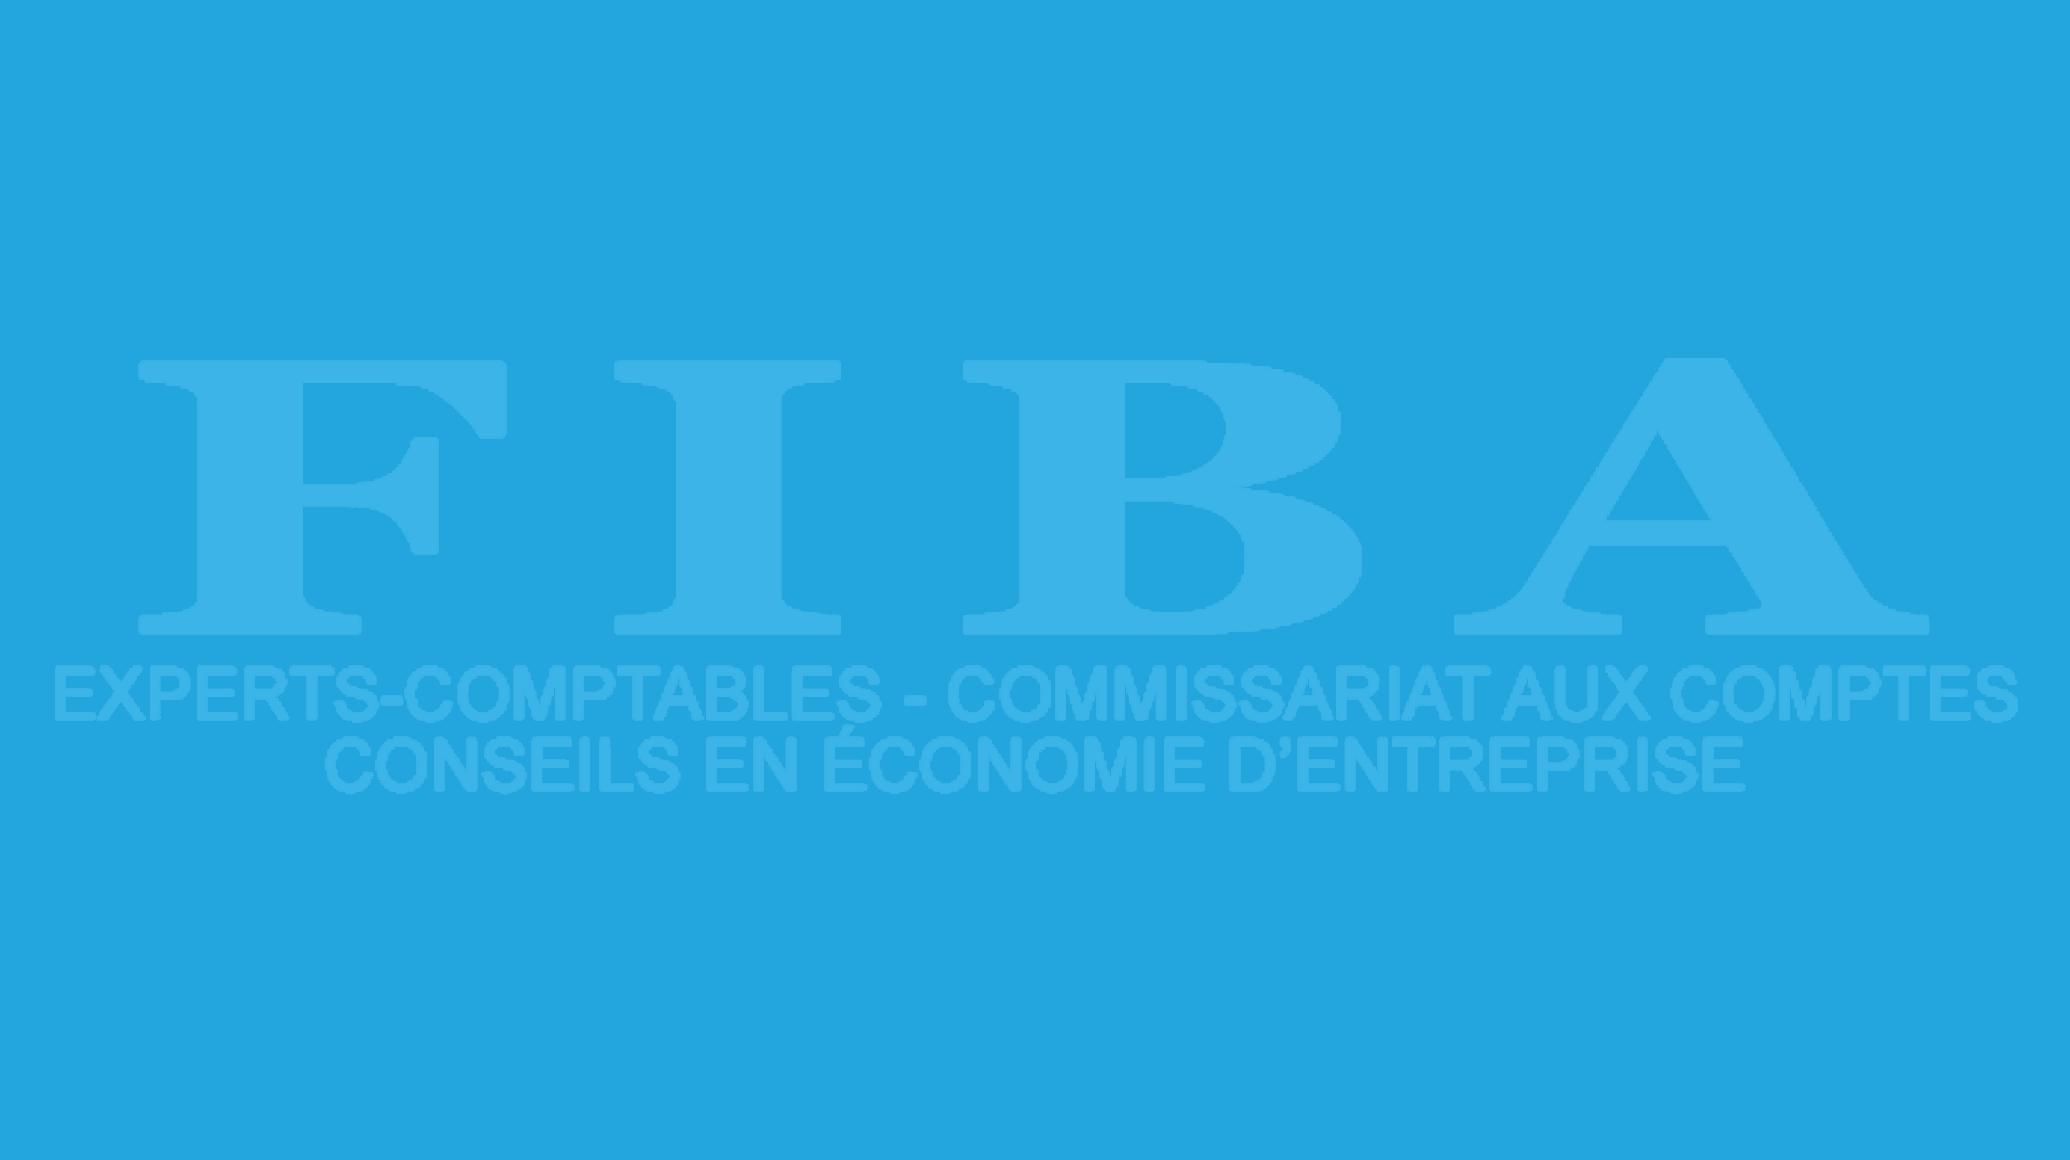 FIBA - membre du cercle Perspectives